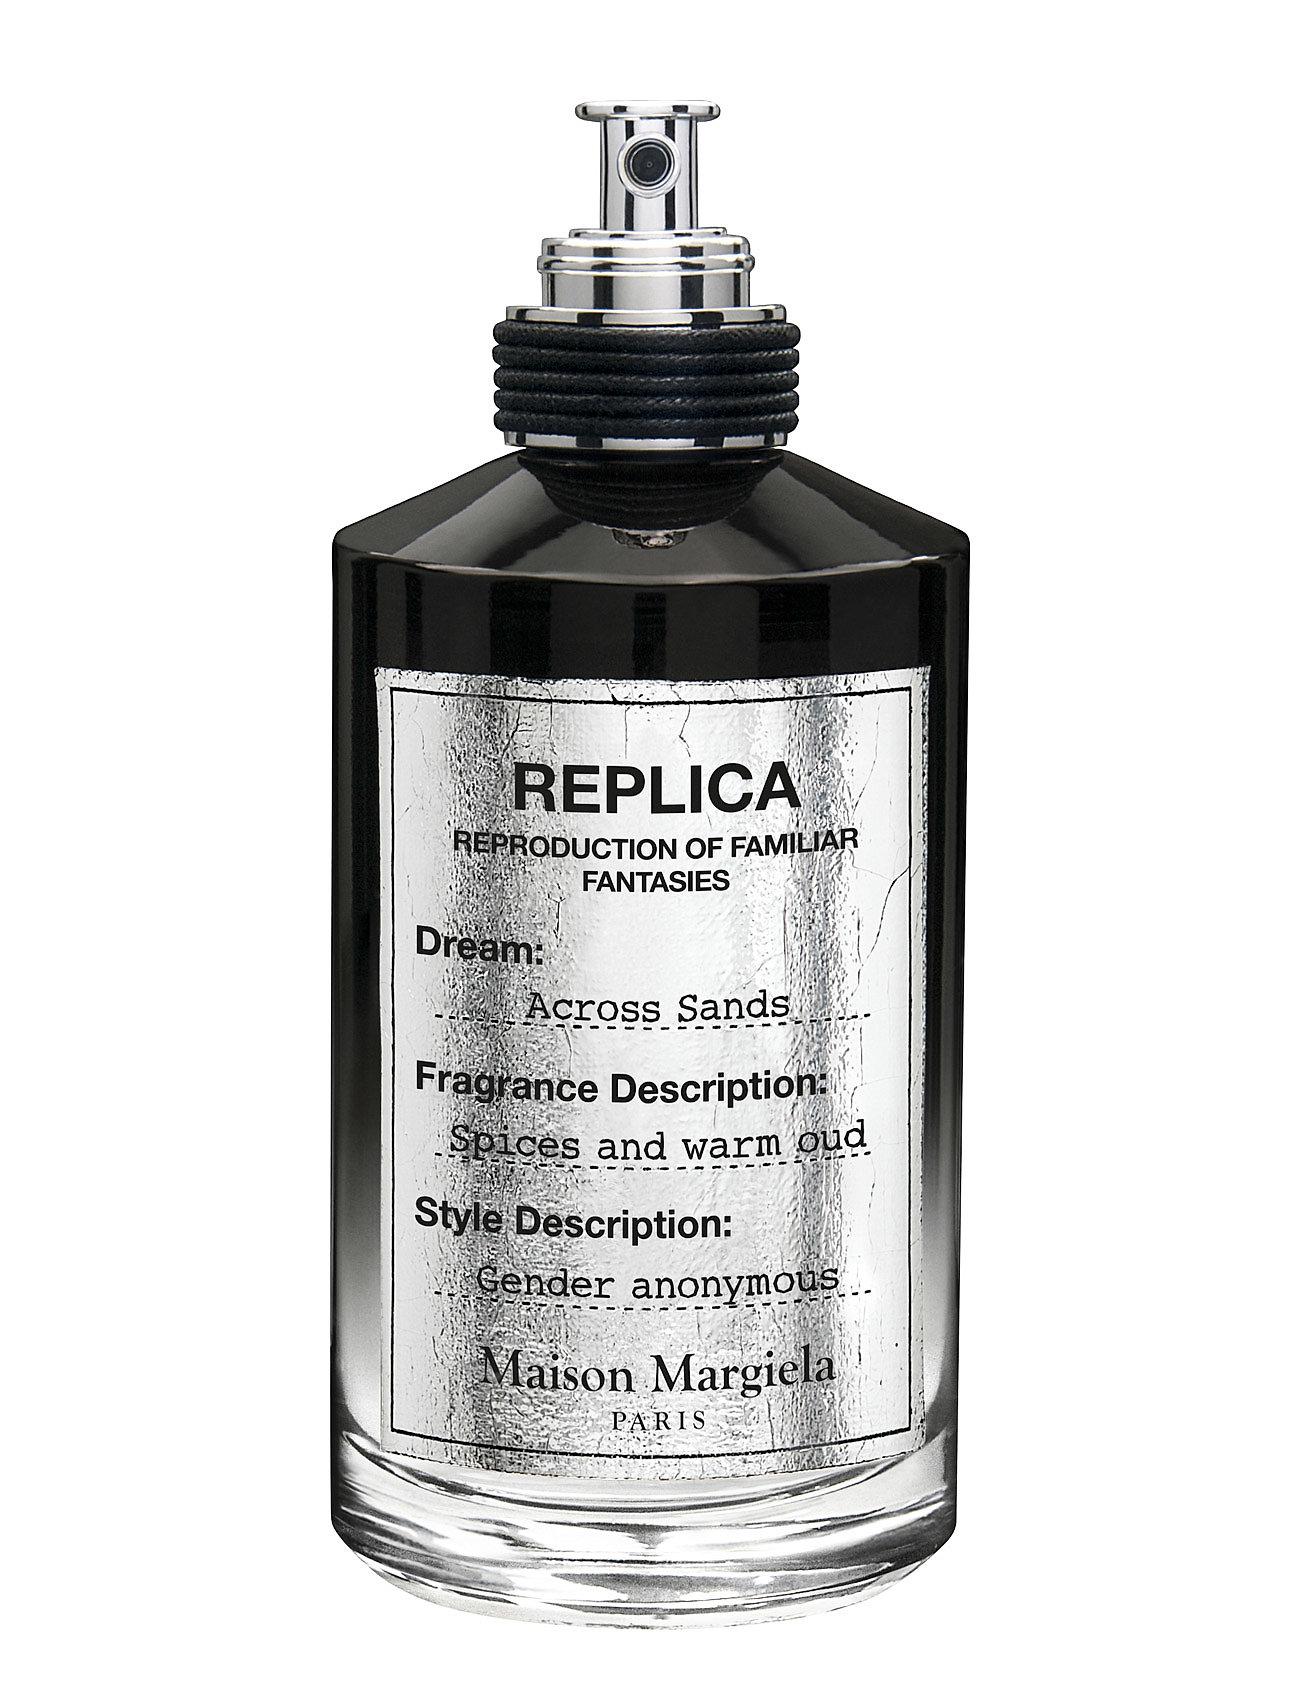 maison margiela Maison margiela replica across sands eau de parfum 100 ml fra boozt.com dk